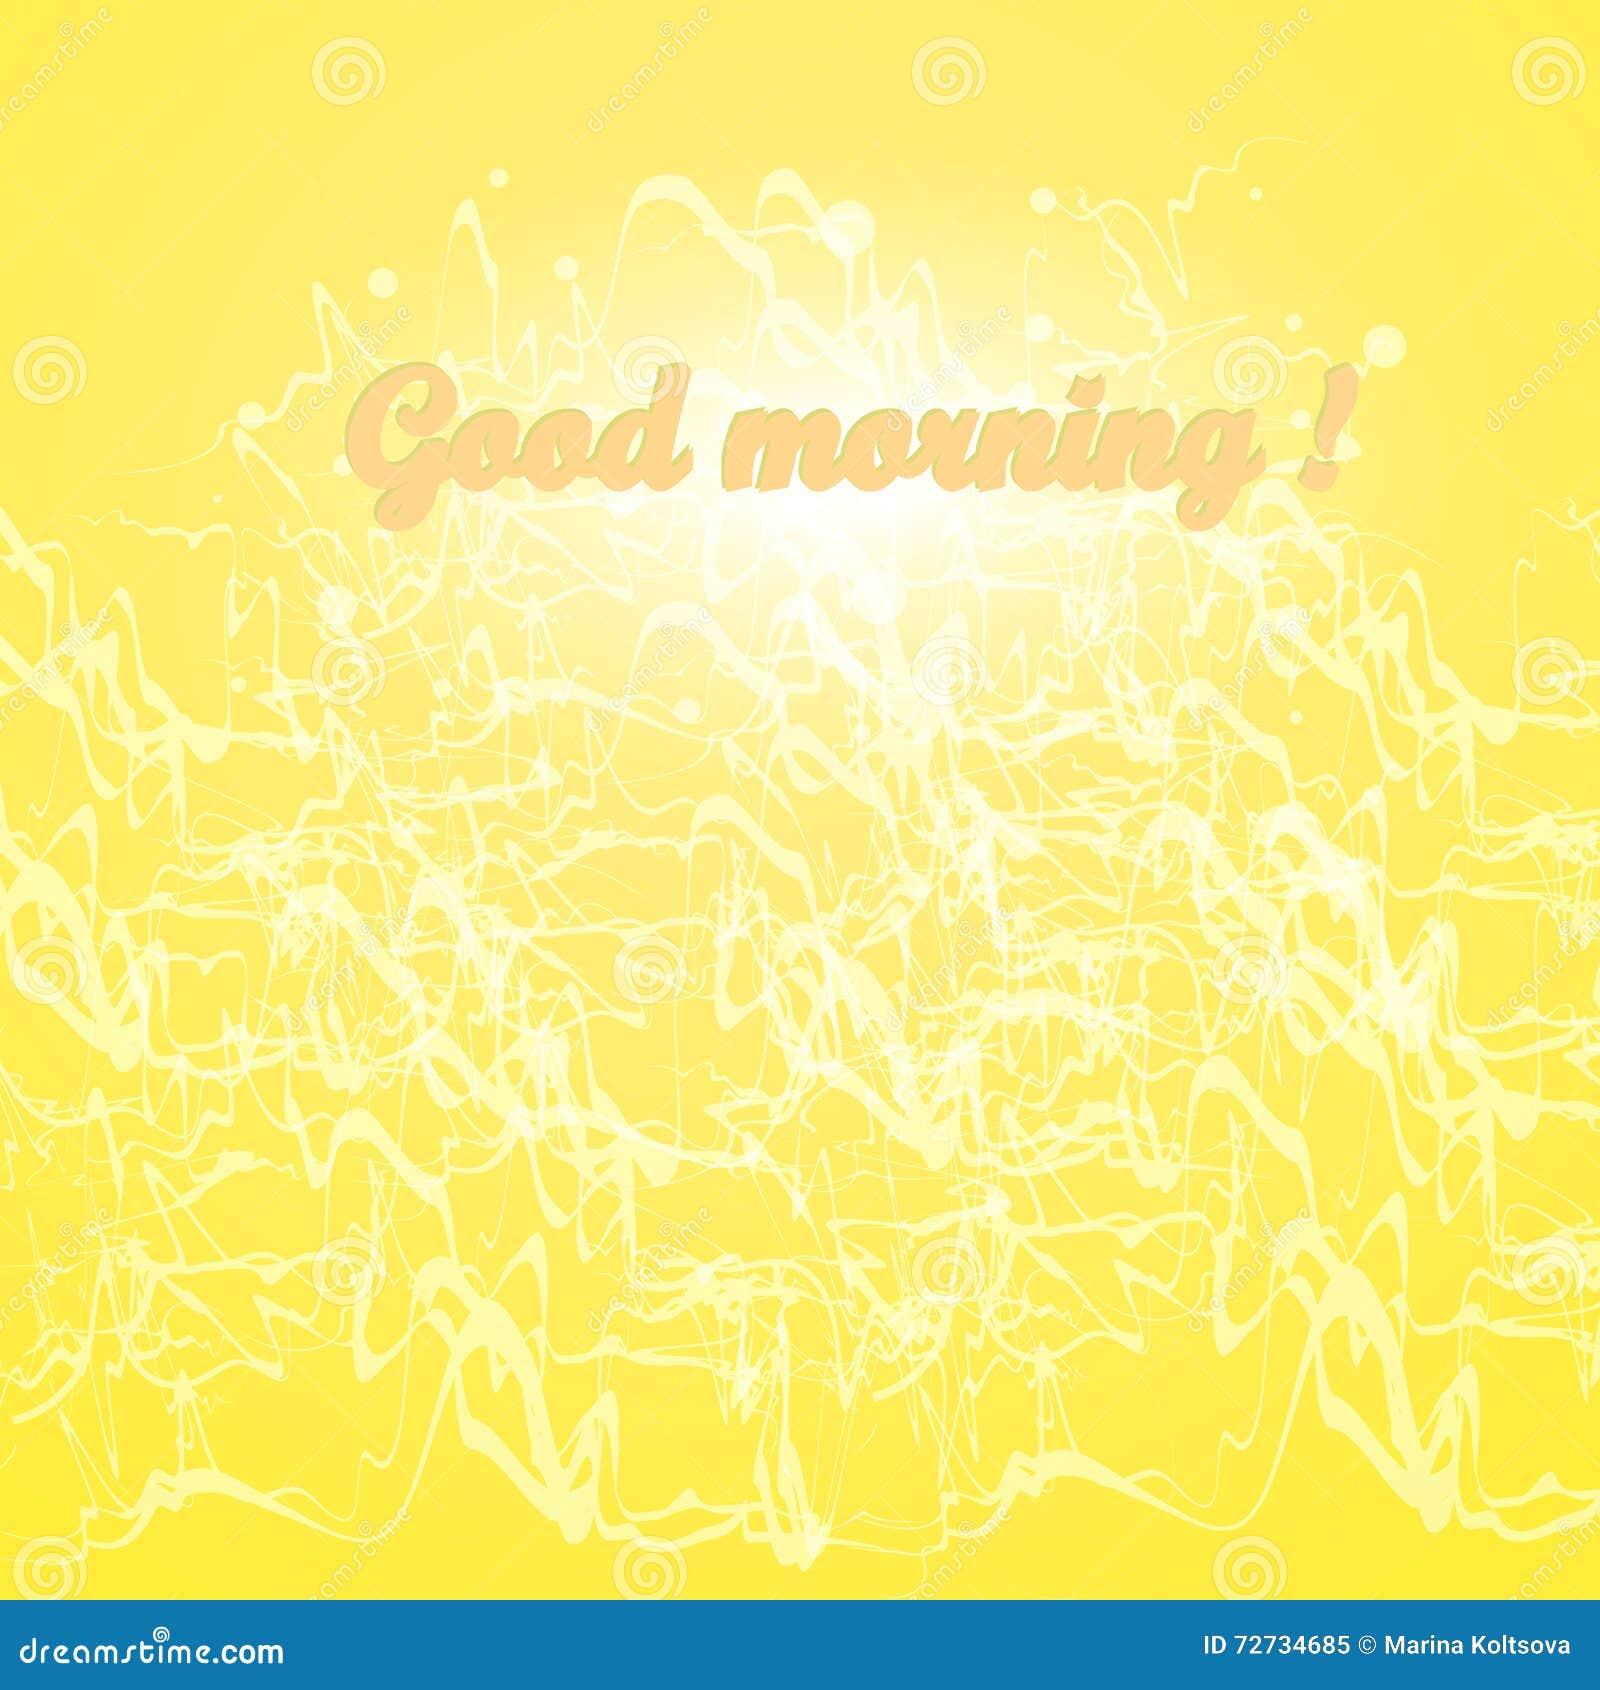 good morning background splashing waves glow vector image abstraction phrase 72734685 Black Coffee Good For You Good Morning Note Stock Vector Image